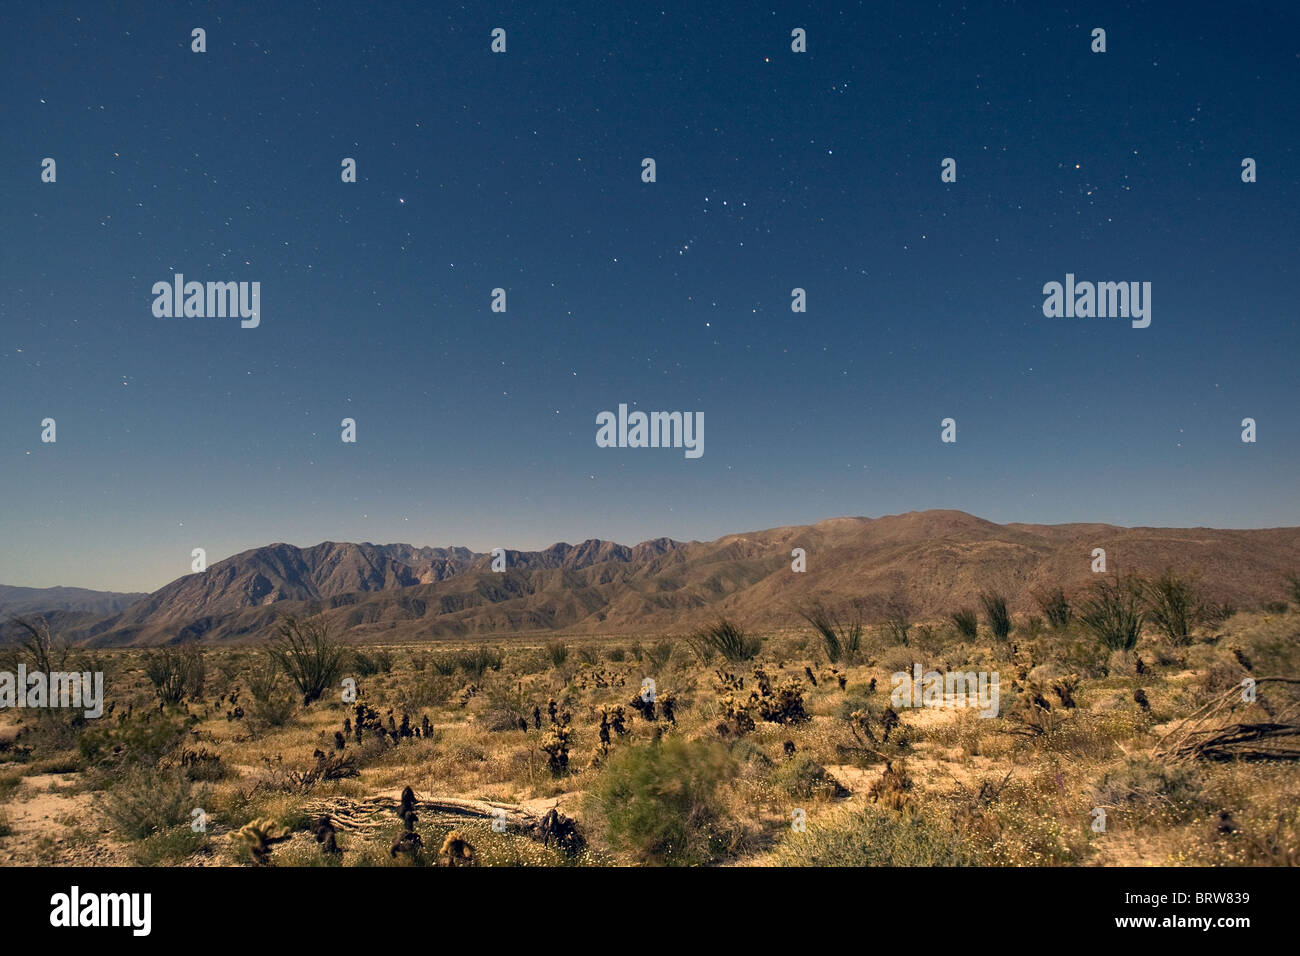 Clear night sky in Anza Borrego Desert State Park, California. - Stock Image